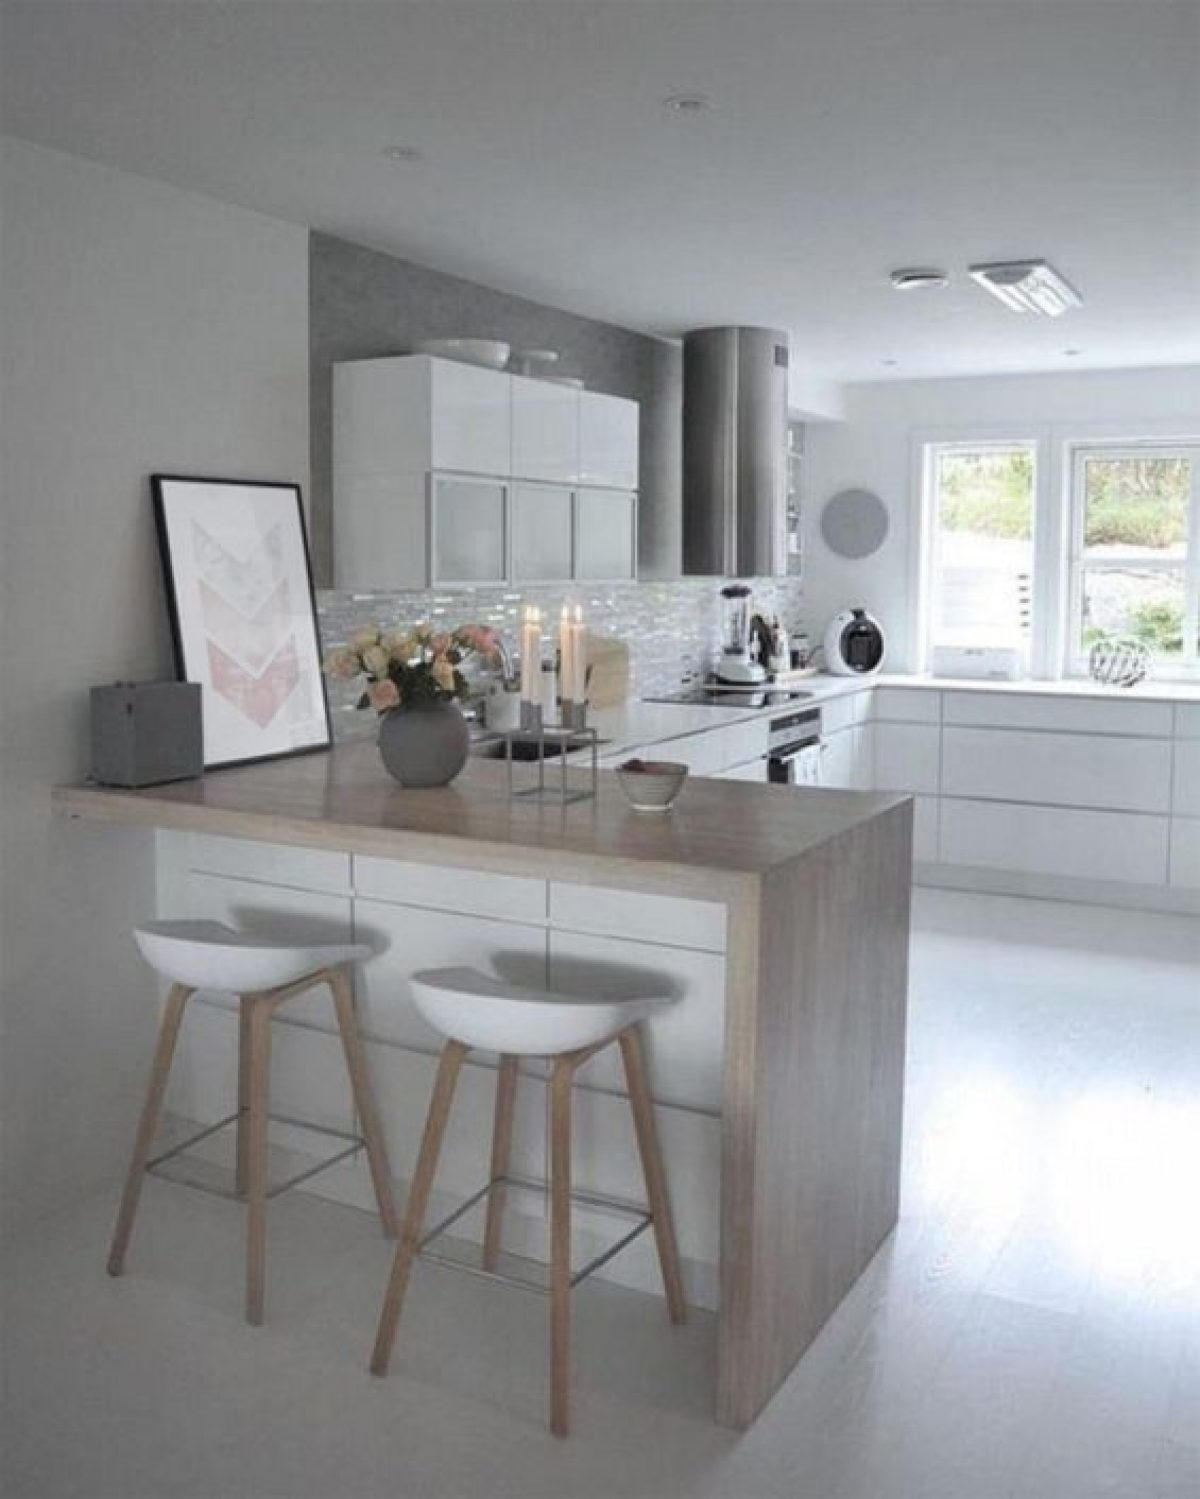 Desain Dapur Minimalis Sederhana Dan Cantik Untuk Rumah Idaman